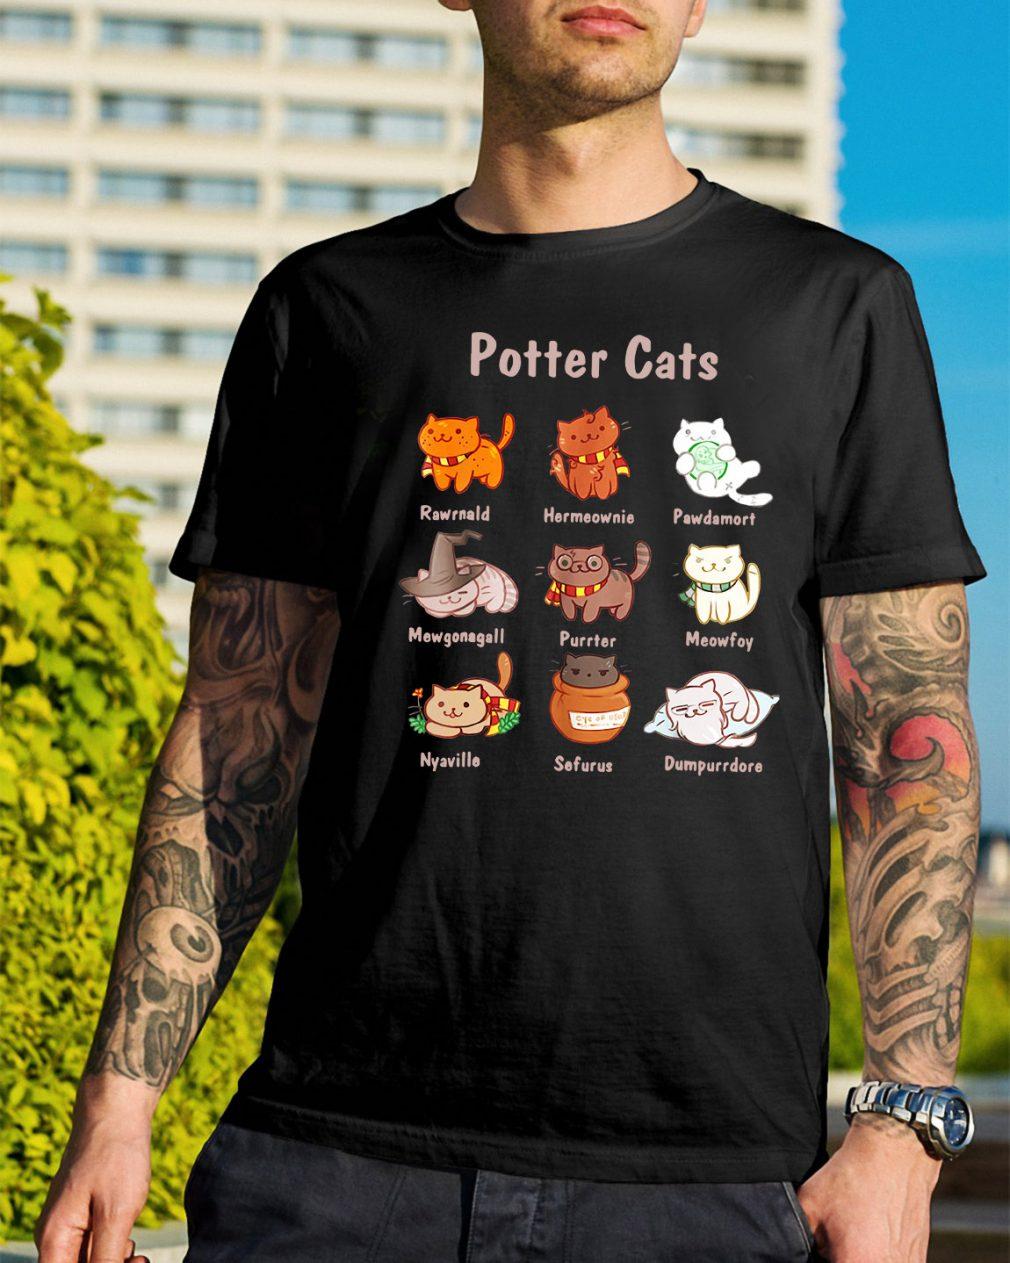 Potter cats Rawrnald Hermeownie Pawdamort shirt